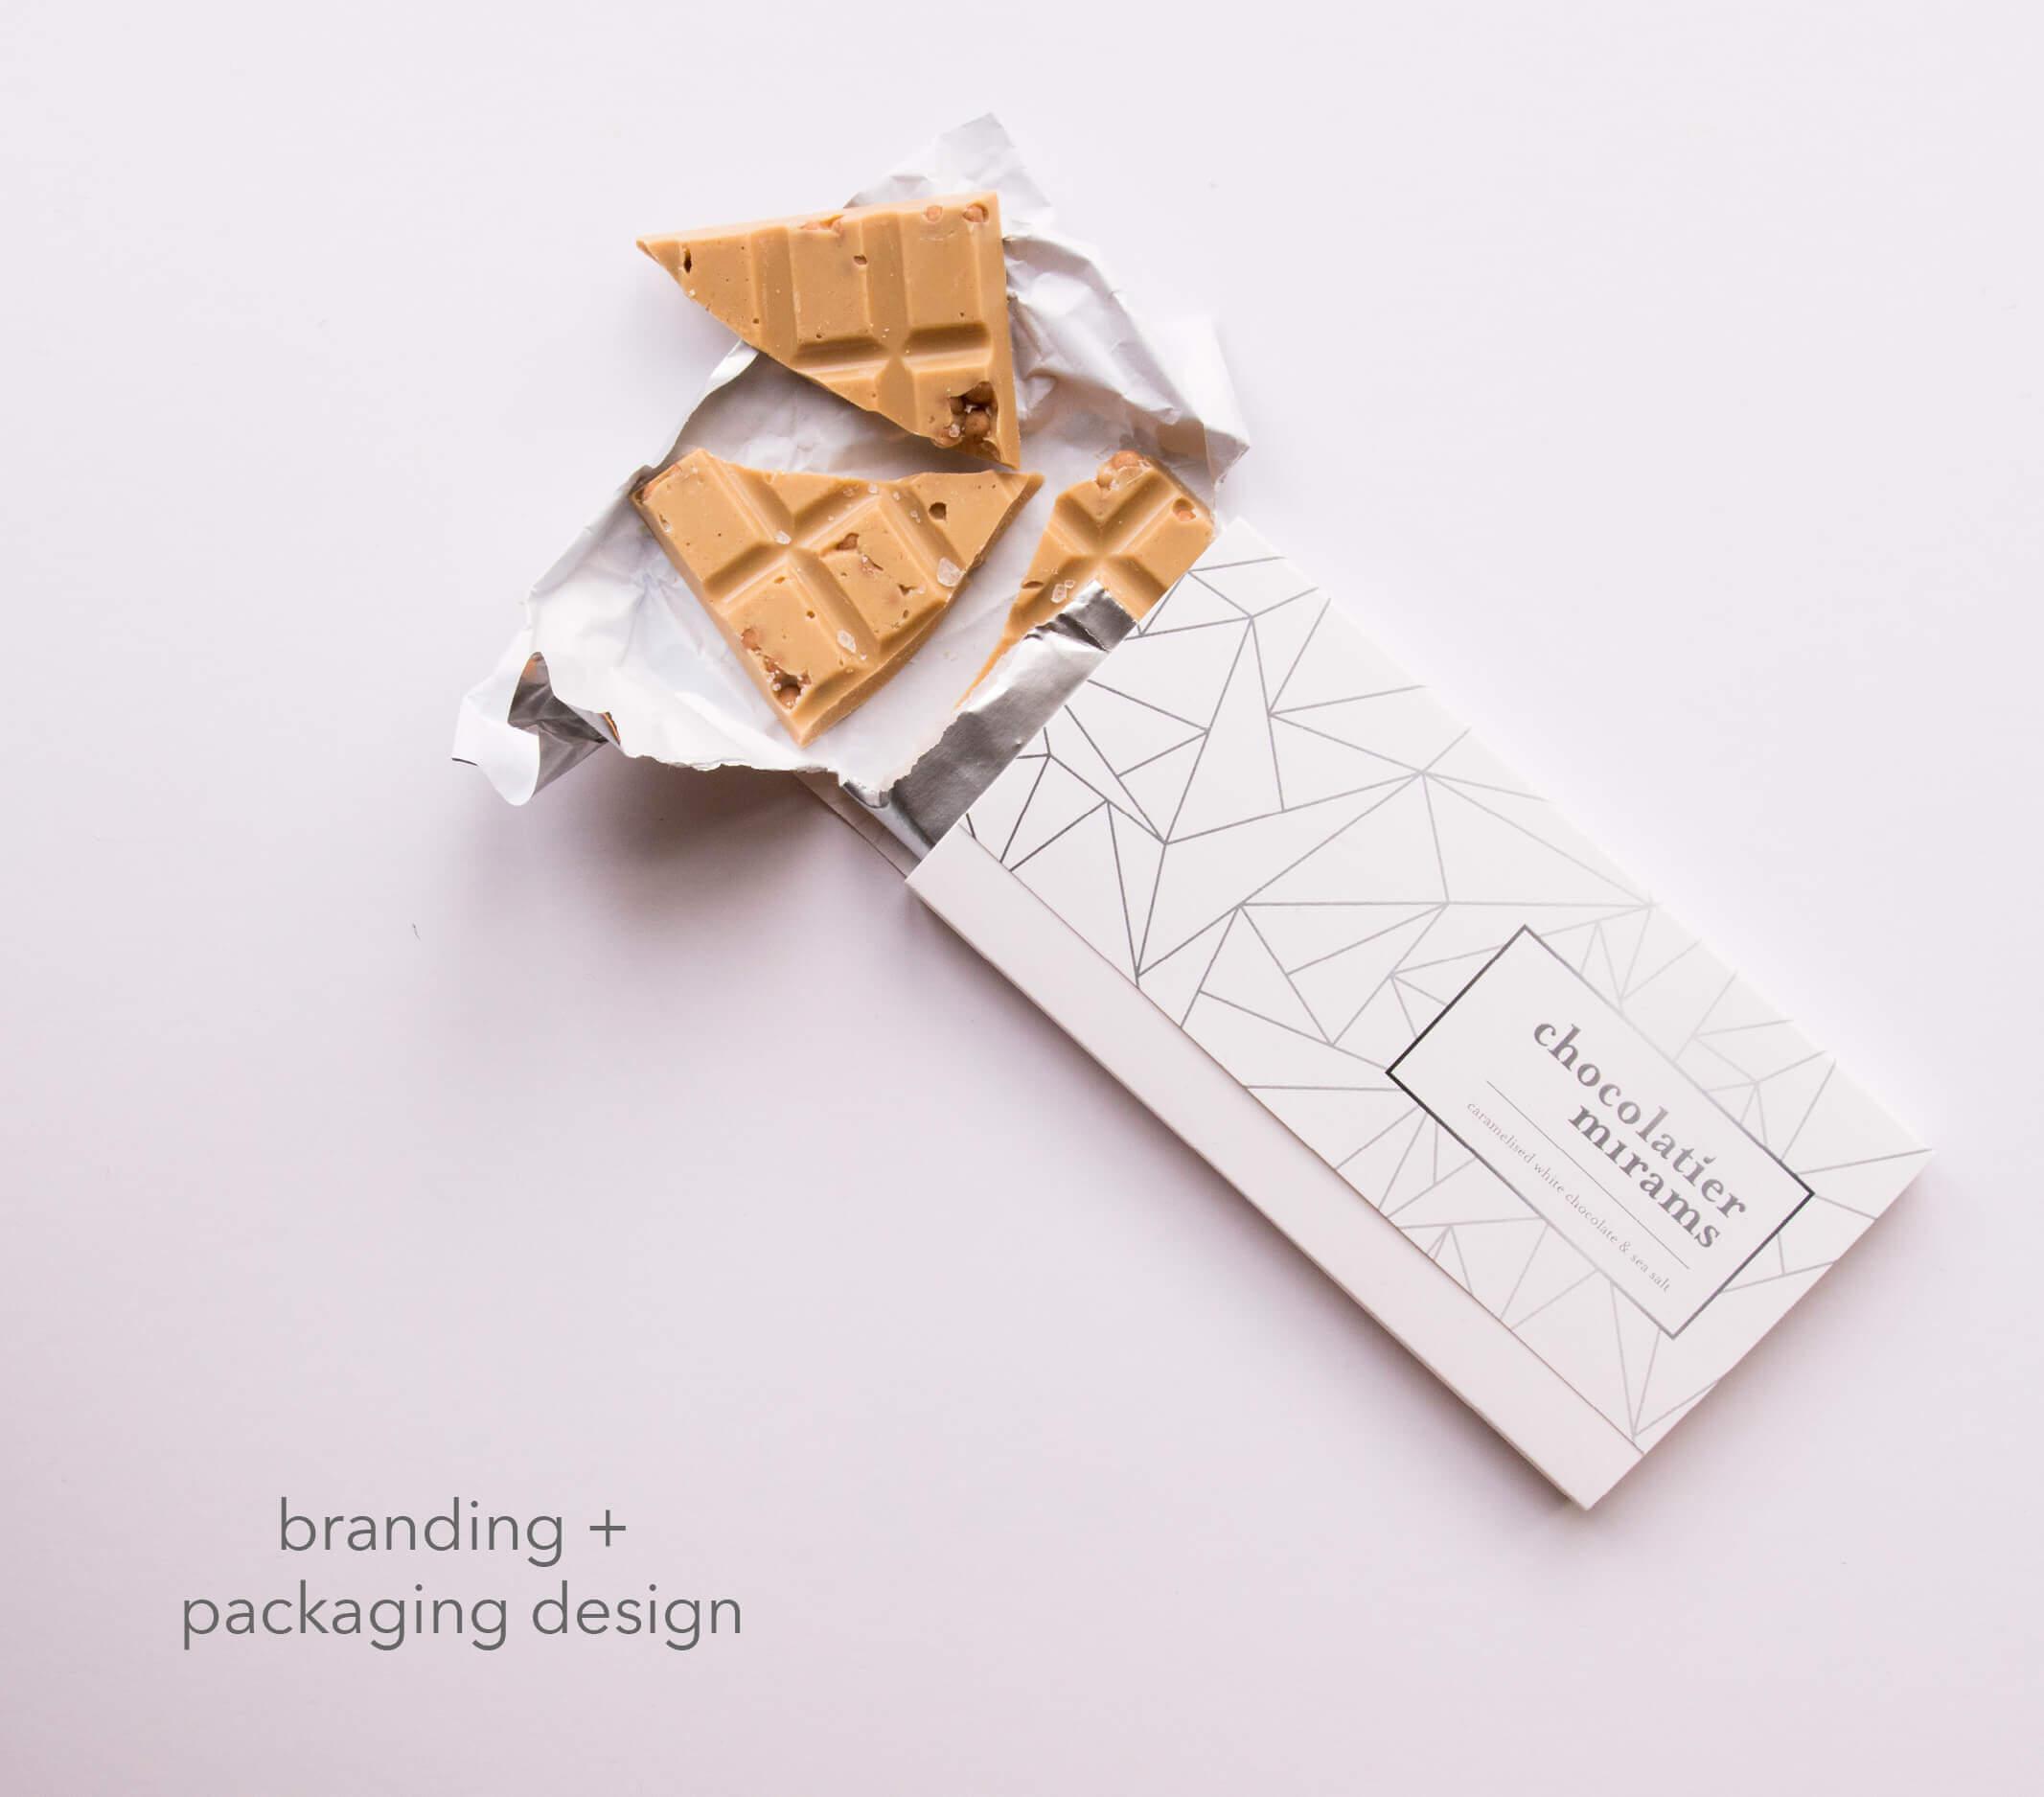 Chocolatier Mirams Brand